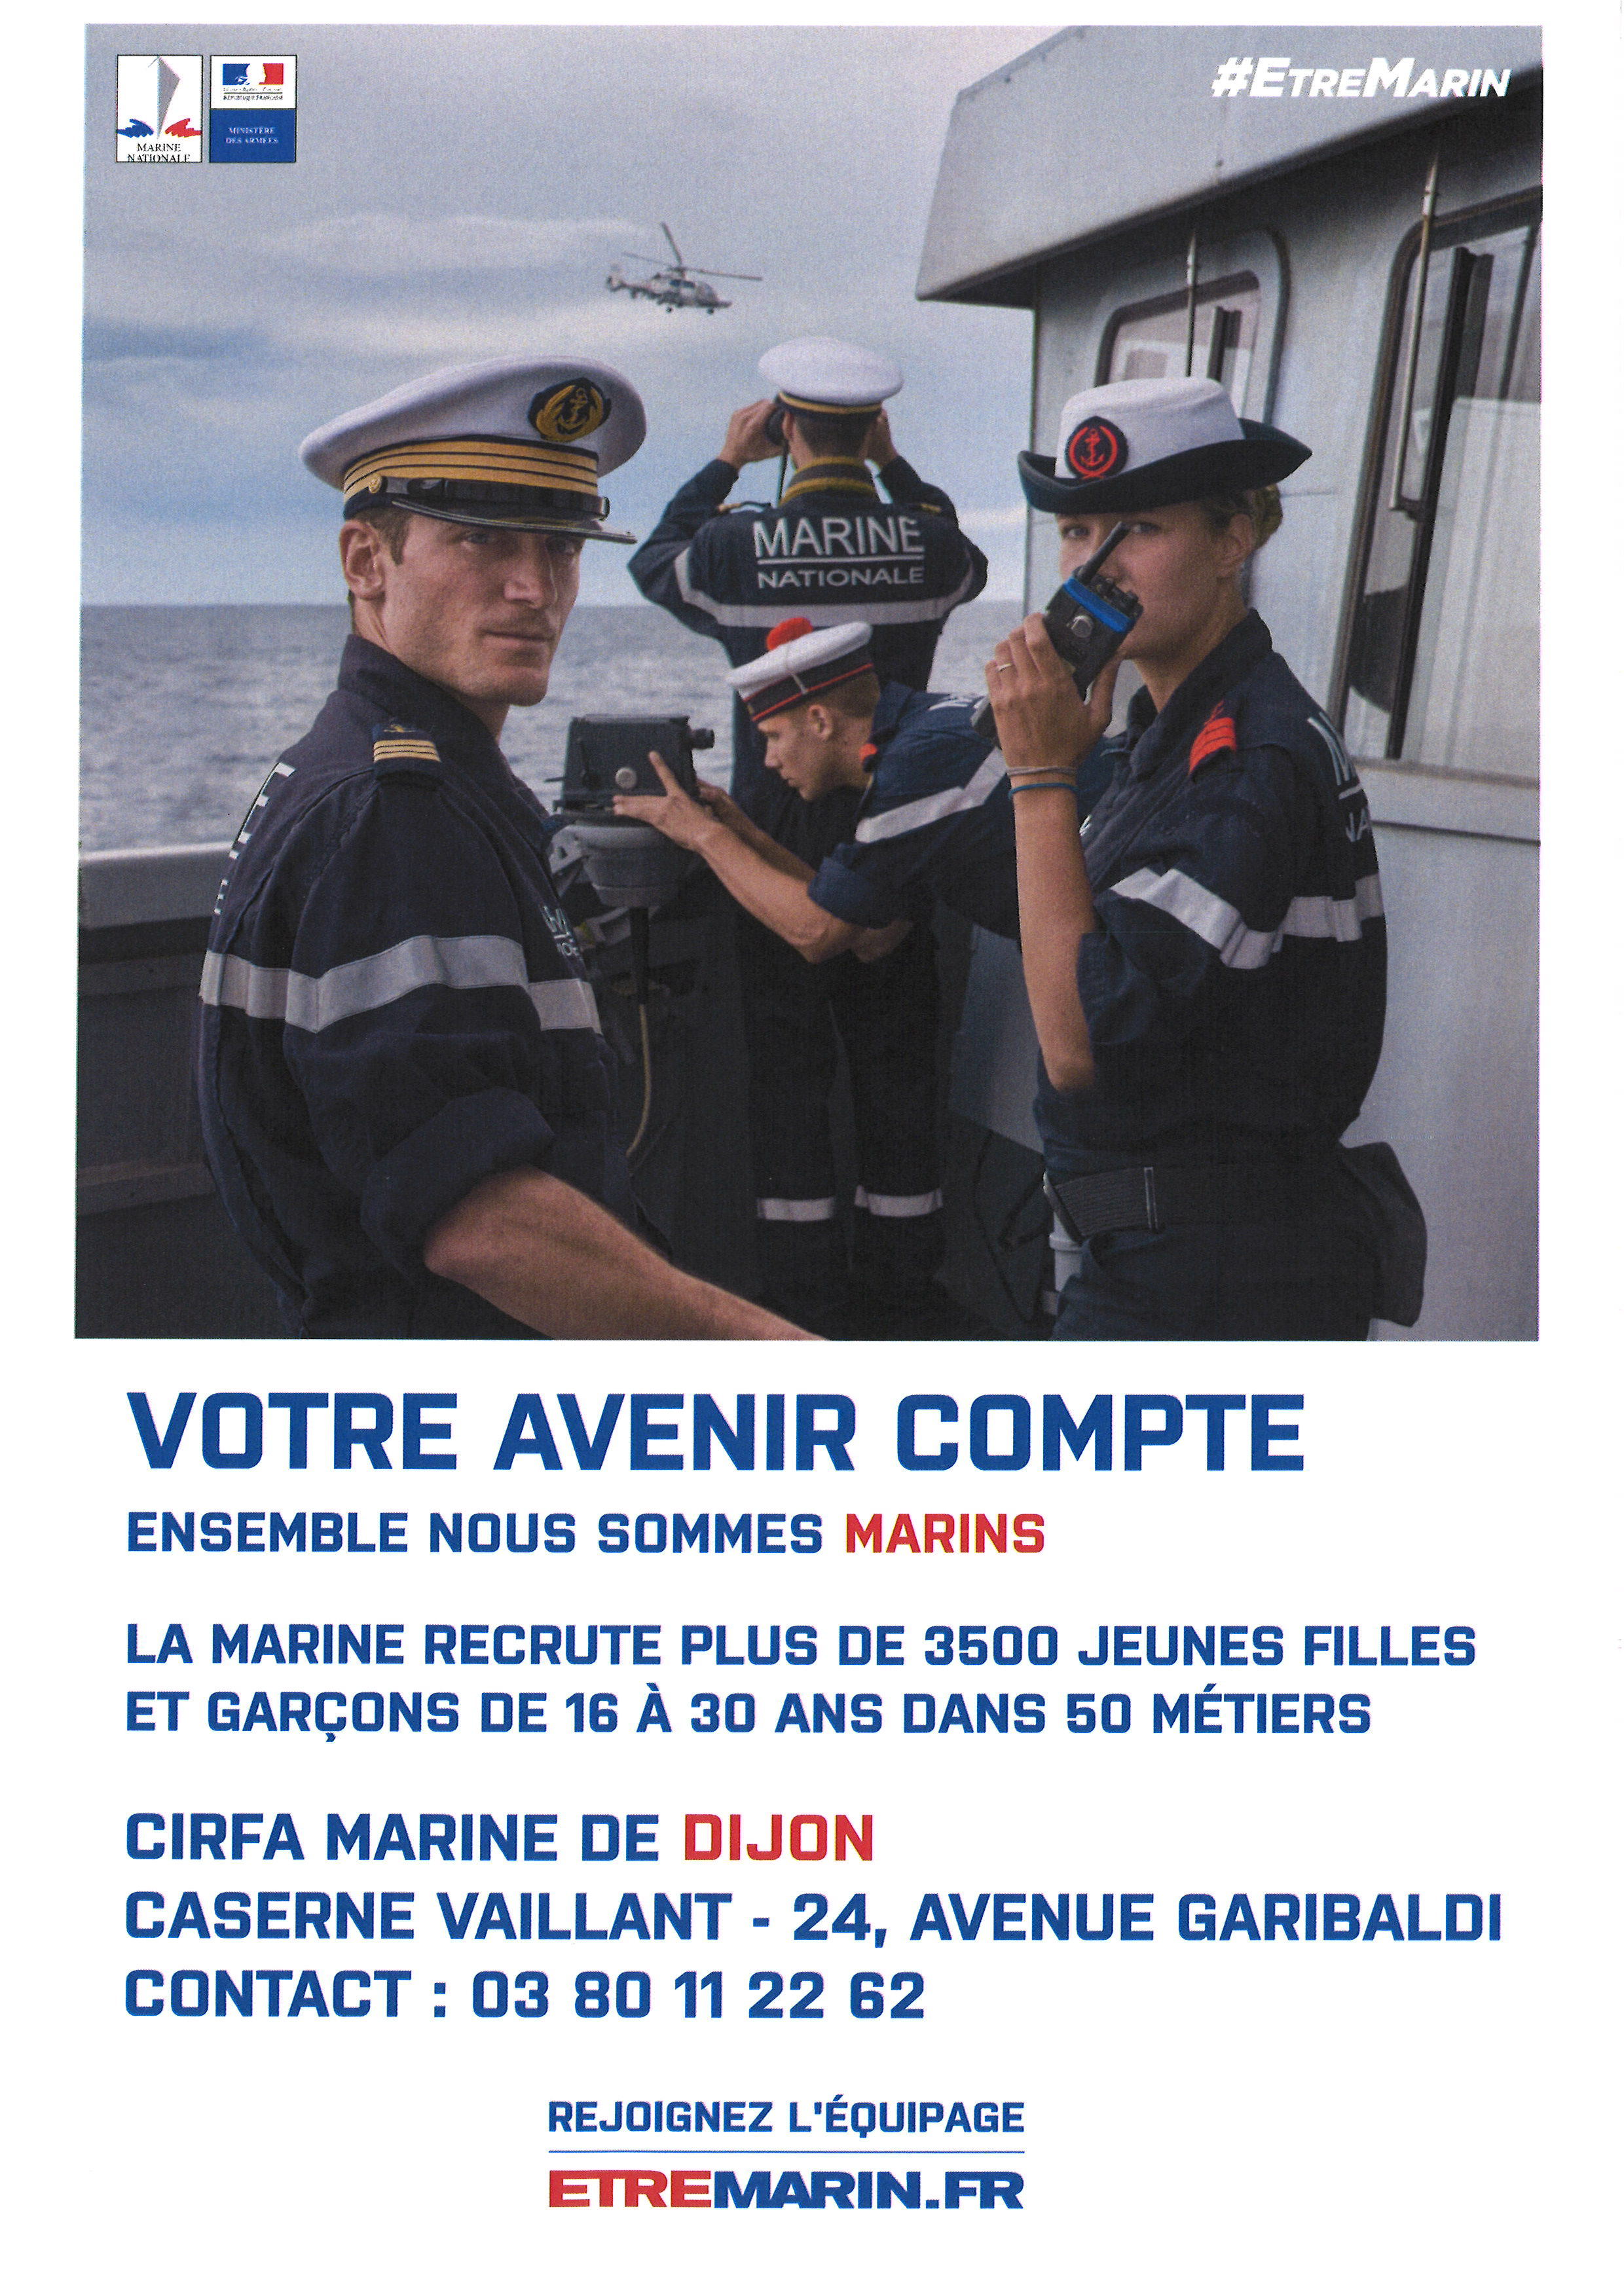 Affiche marine recrutement.jpg